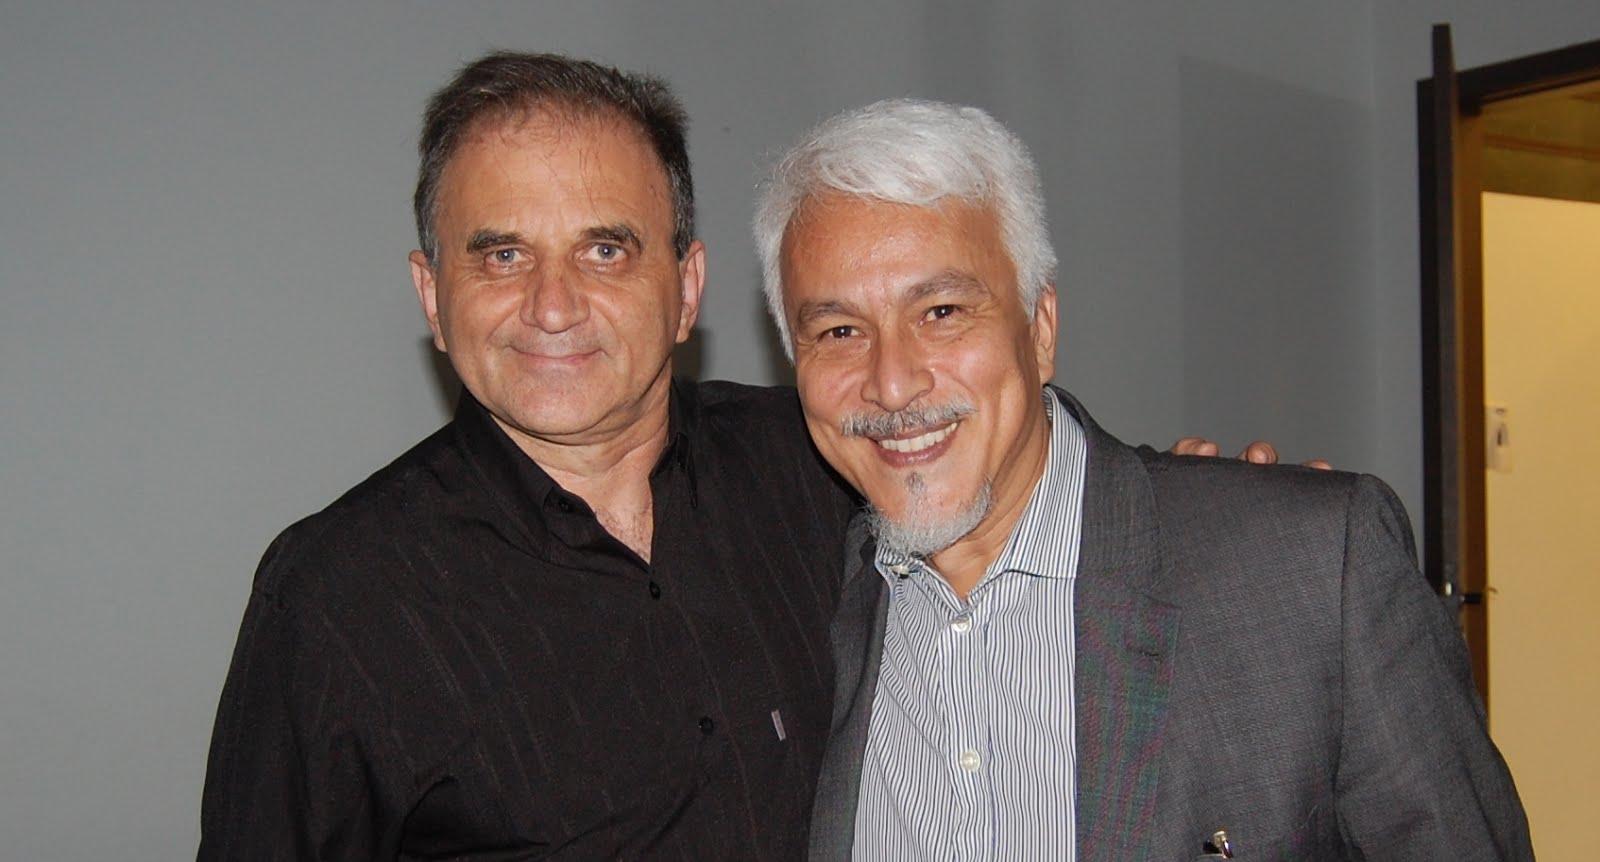 Airton Engster dos Santos e Eduardo Shinyashiki